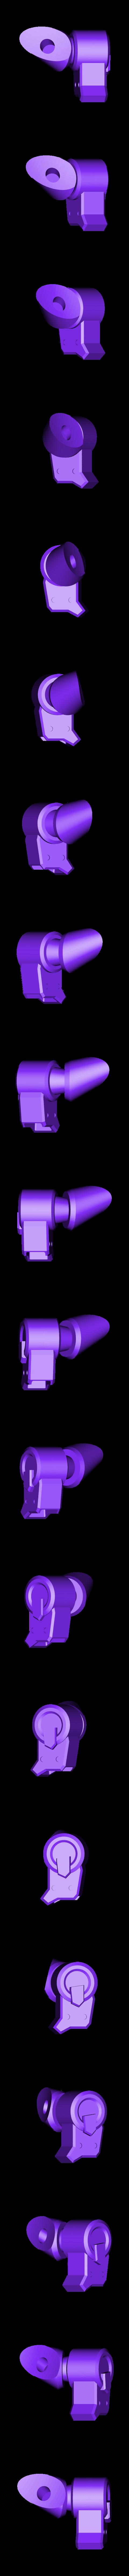 Thigh-LeftFront.stl Download STL file Hammond's Wrecking Ball Mech from Overwatch • 3D printer template, FunbieStudios